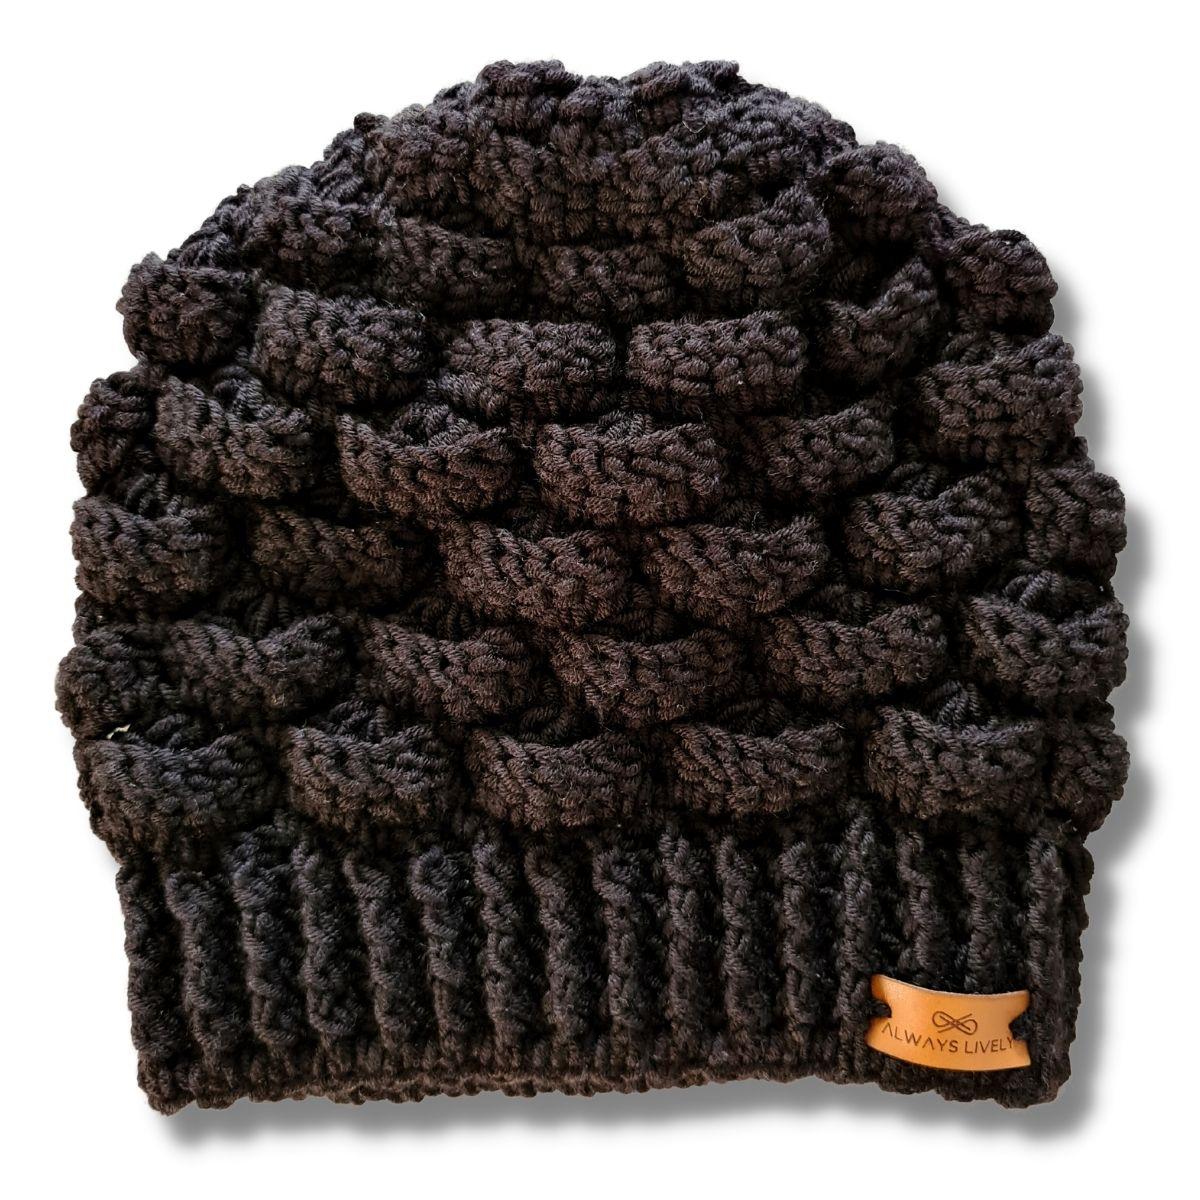 Kit Gorro Crochê Cloud Preto + Touca Sleep Preta